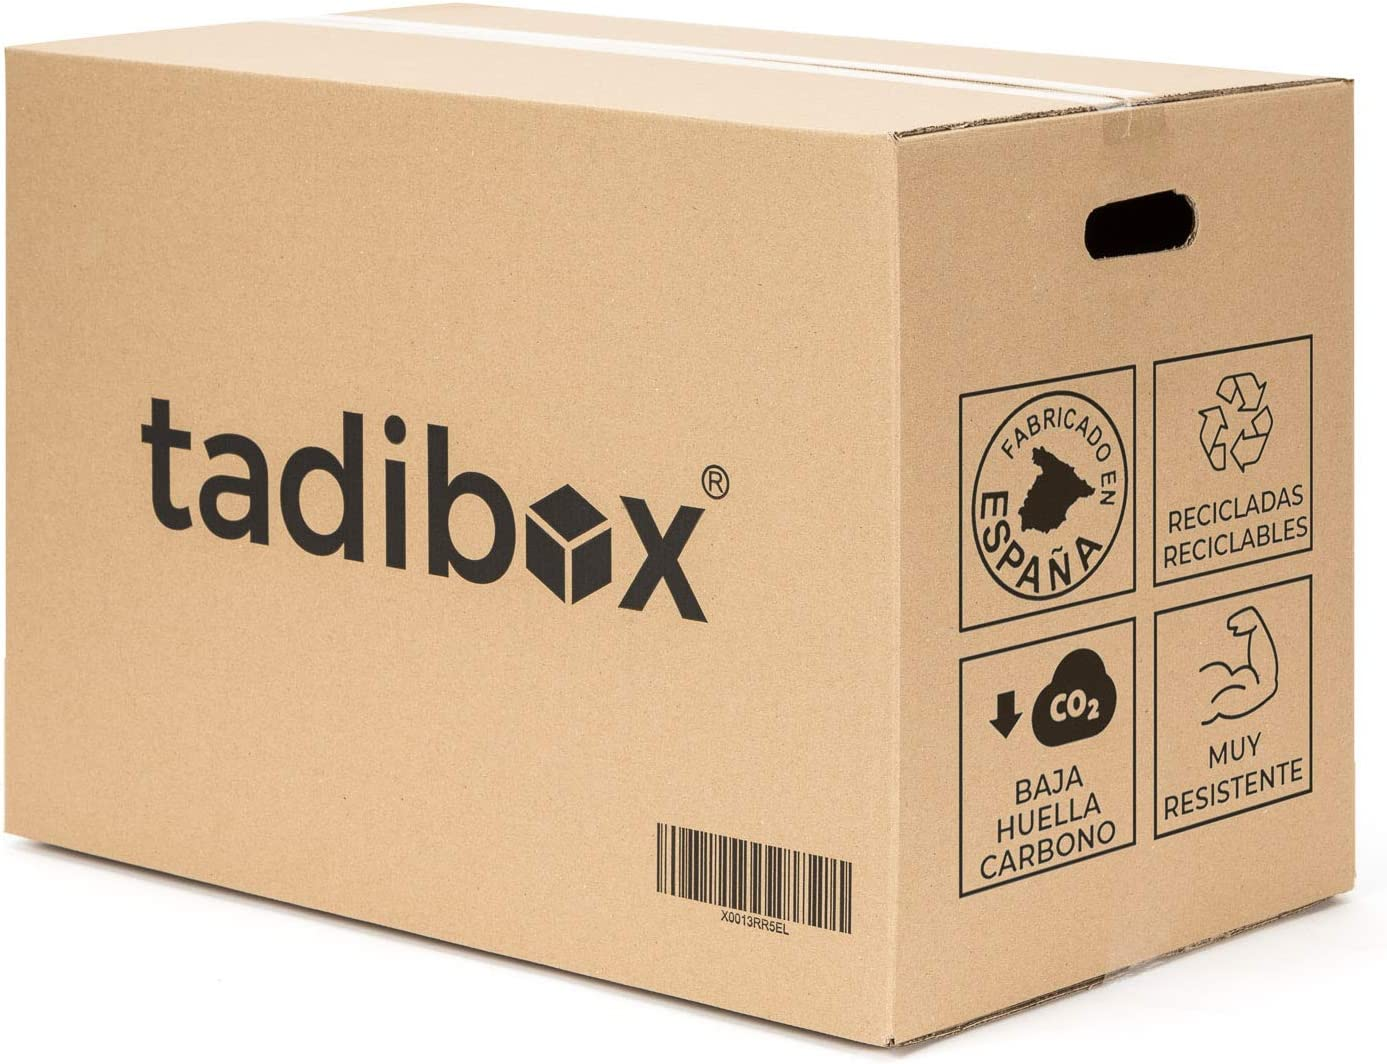 7 Cajas de Cartón para Mudanza (Talla L) con Asas - Extra Resistentes Fabricadas en España - 47x35x39cm Canal Doble Alta Calidad Reforzado - Combina las Cajas de Cartón (M/L/XL) y optimiza